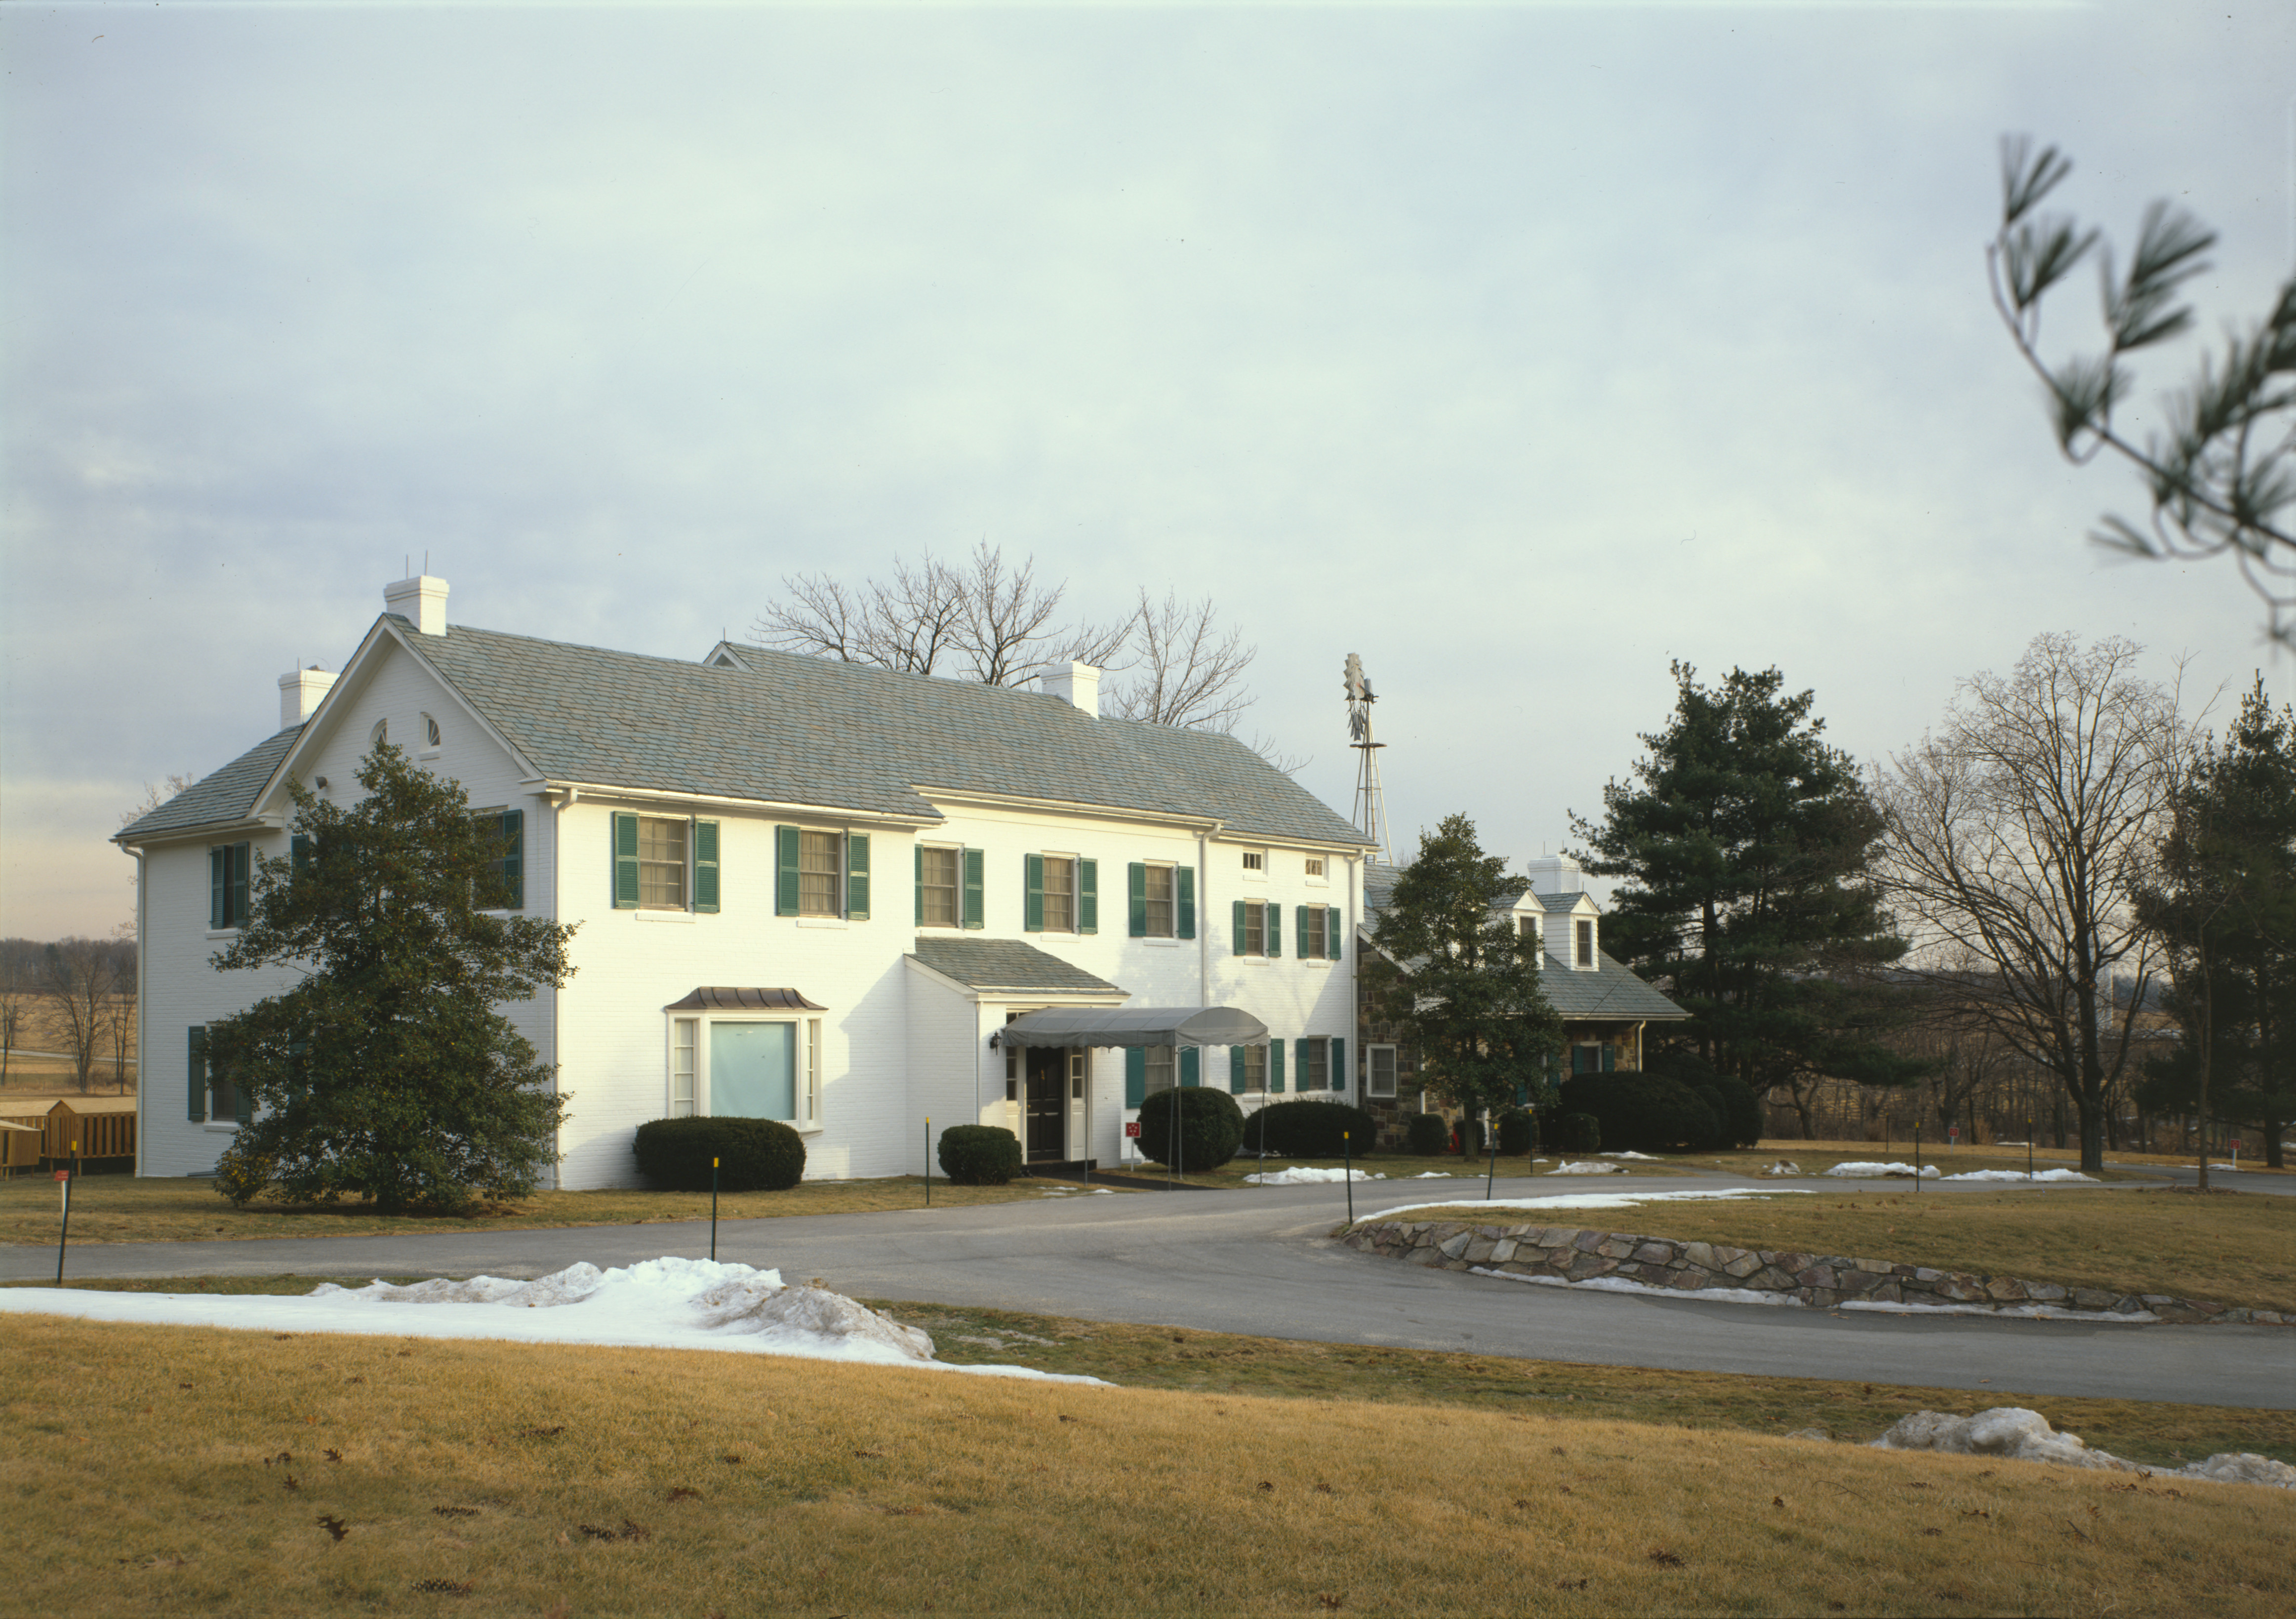 Home of Eisenhower.